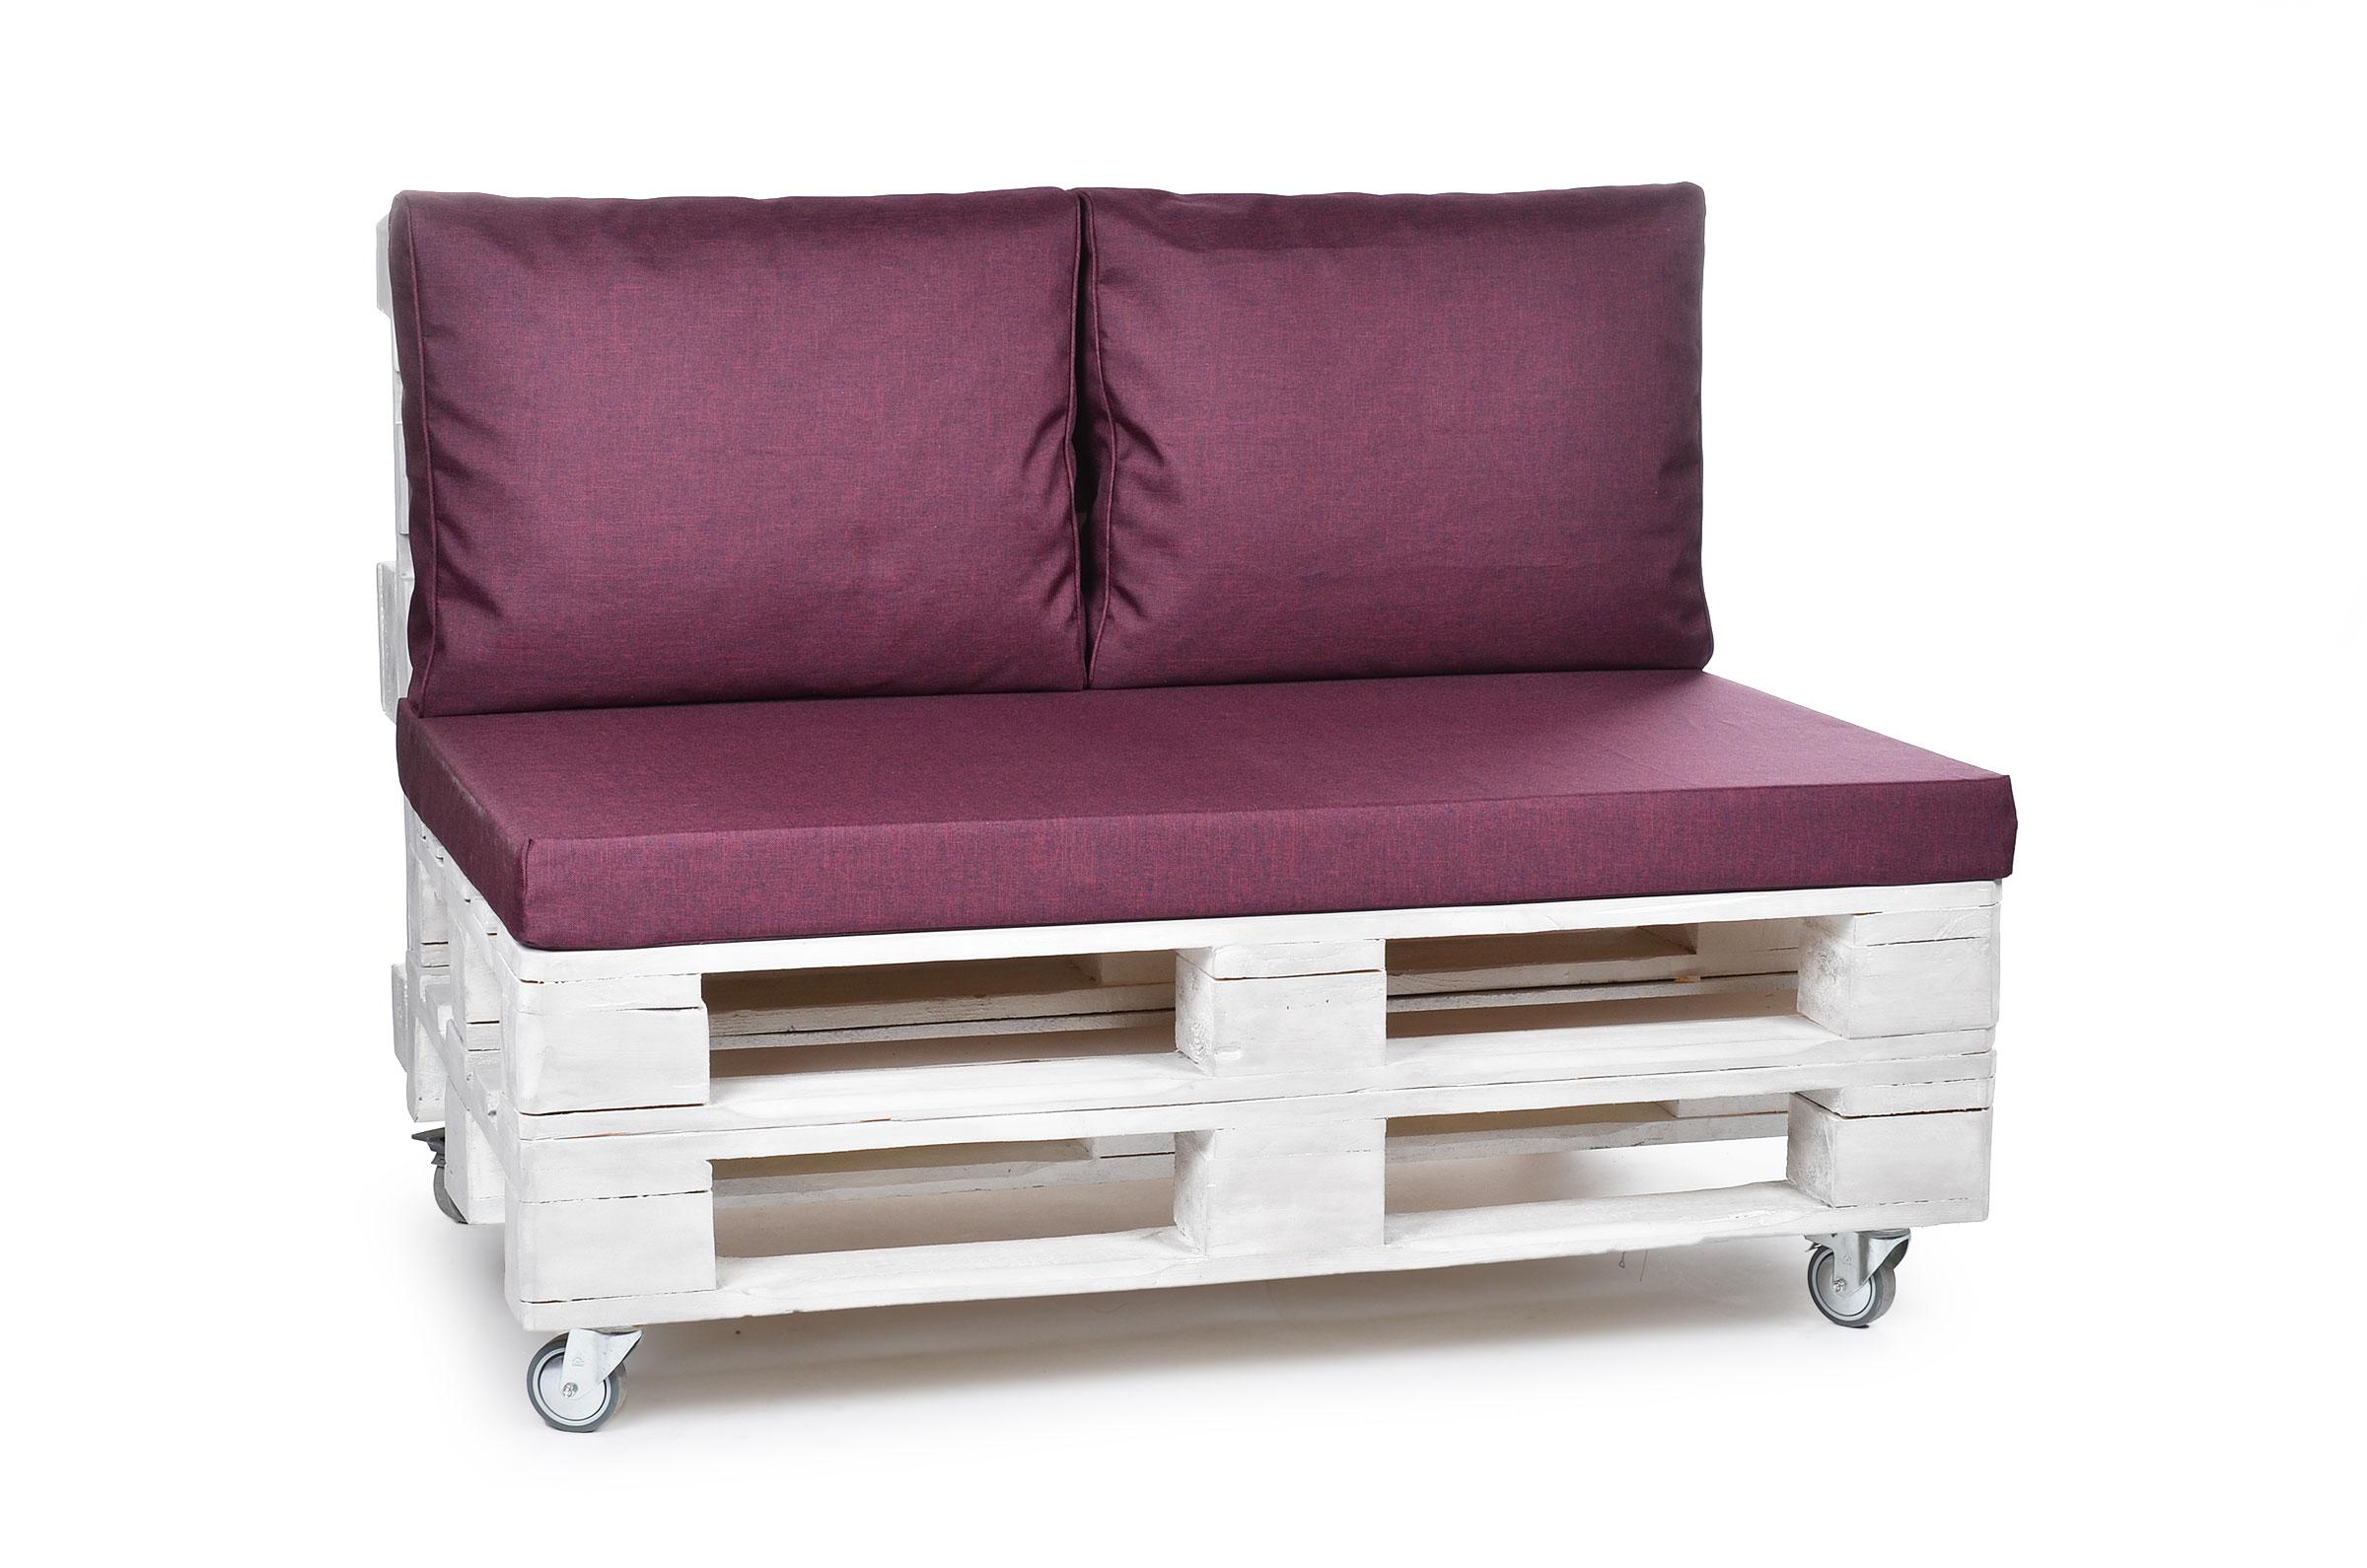 pallet sofa for sale rebecca reversible corner cushions palette cushion range rattan